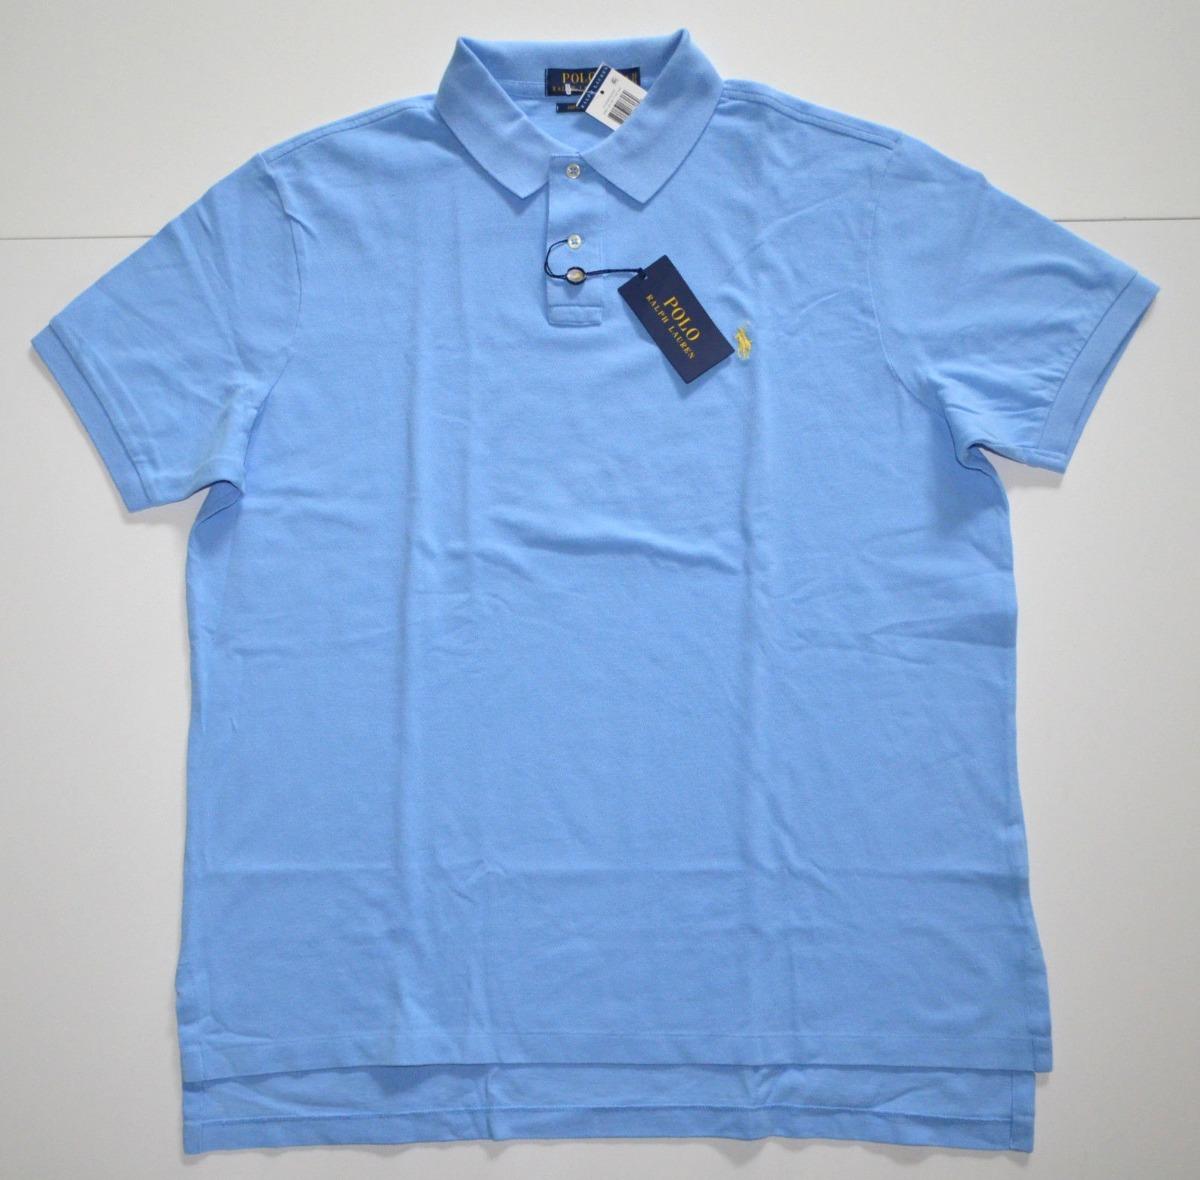 85c05f56a3 camisa polo ralph lauren tamanho xxl ggg slim fit + justa. Carregando zoom.